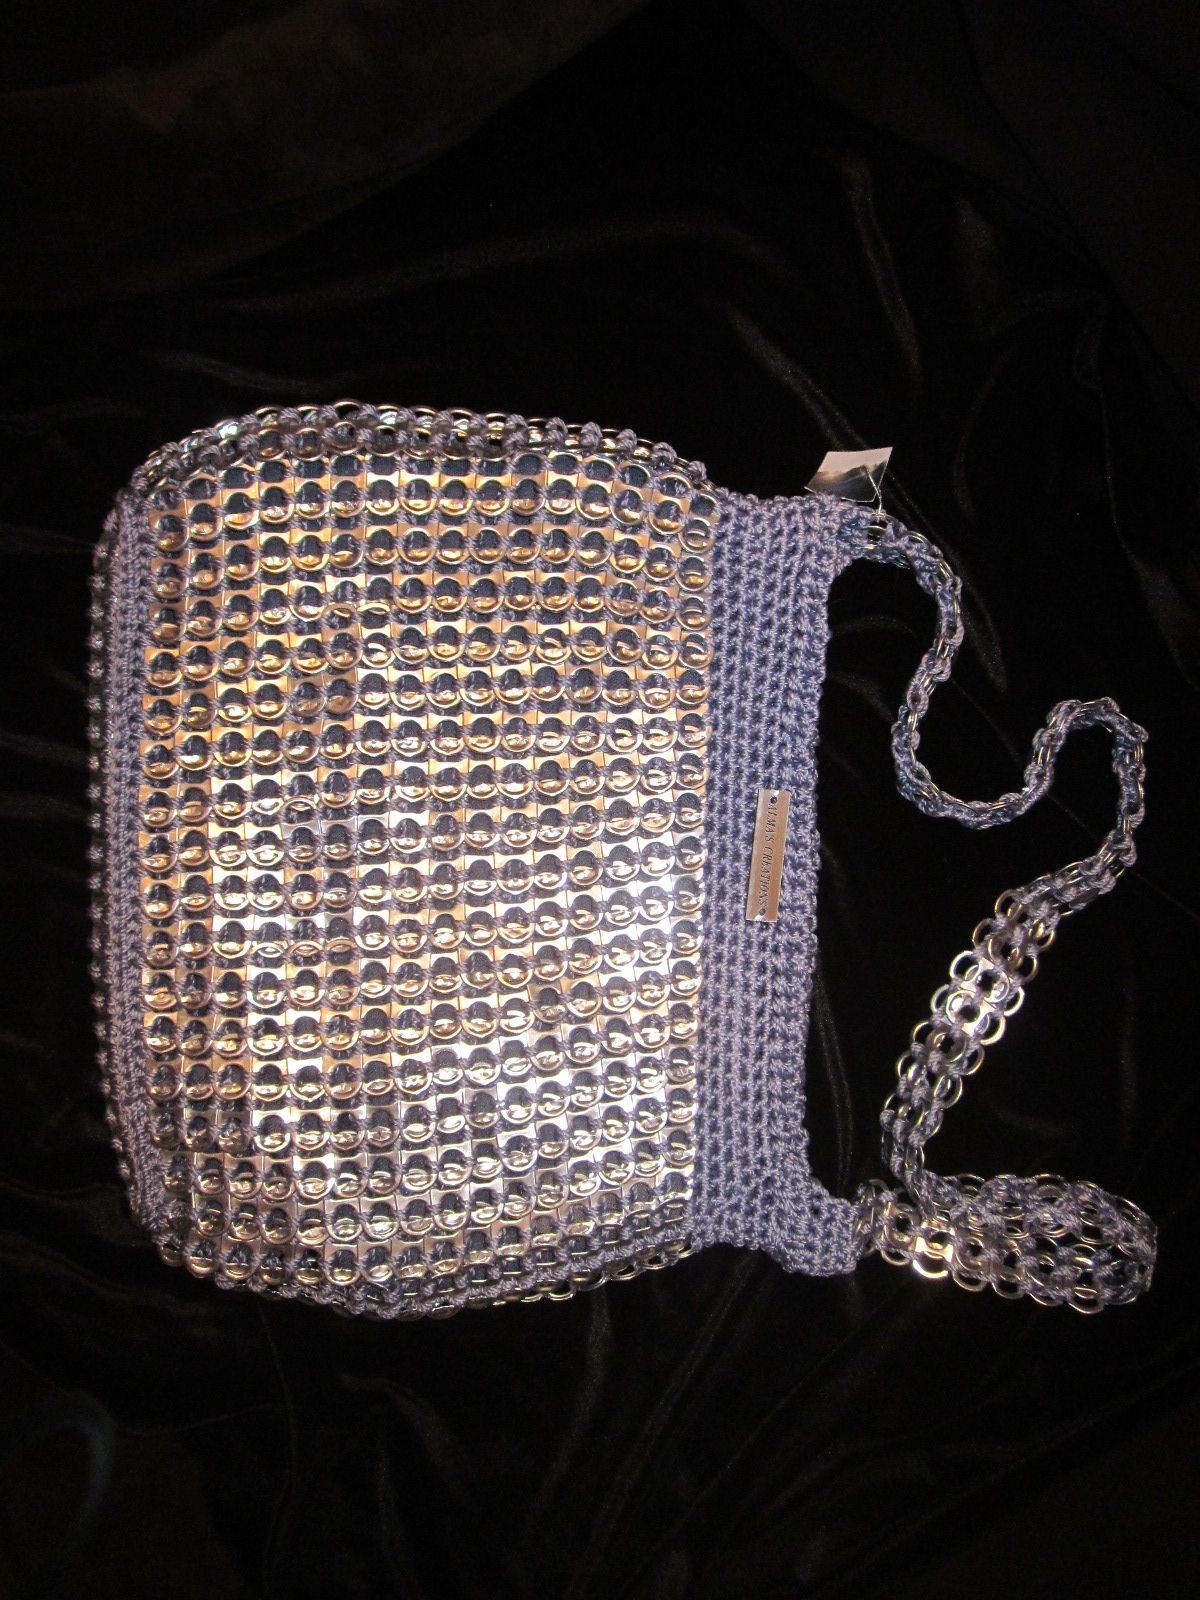 Handmade, one of a kind purse.    Check out almaspursecreations.com!